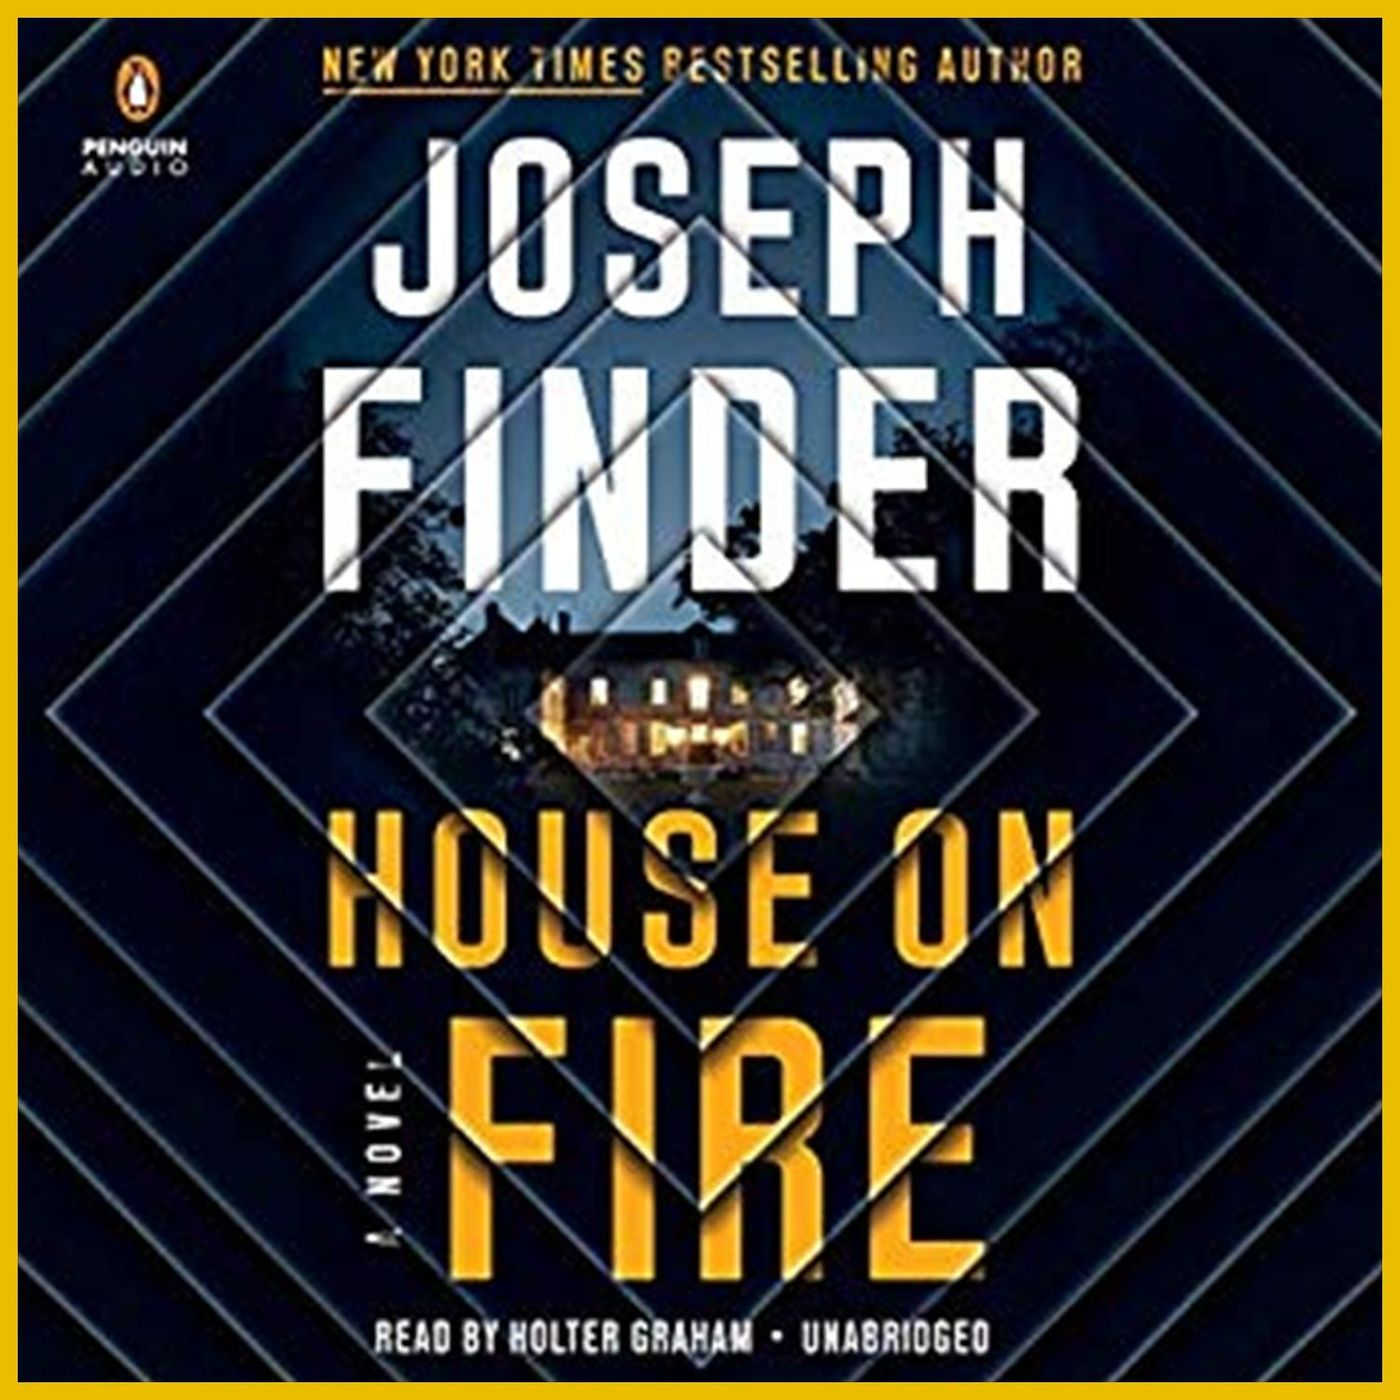 JOSEPH FINDER - House On Fire